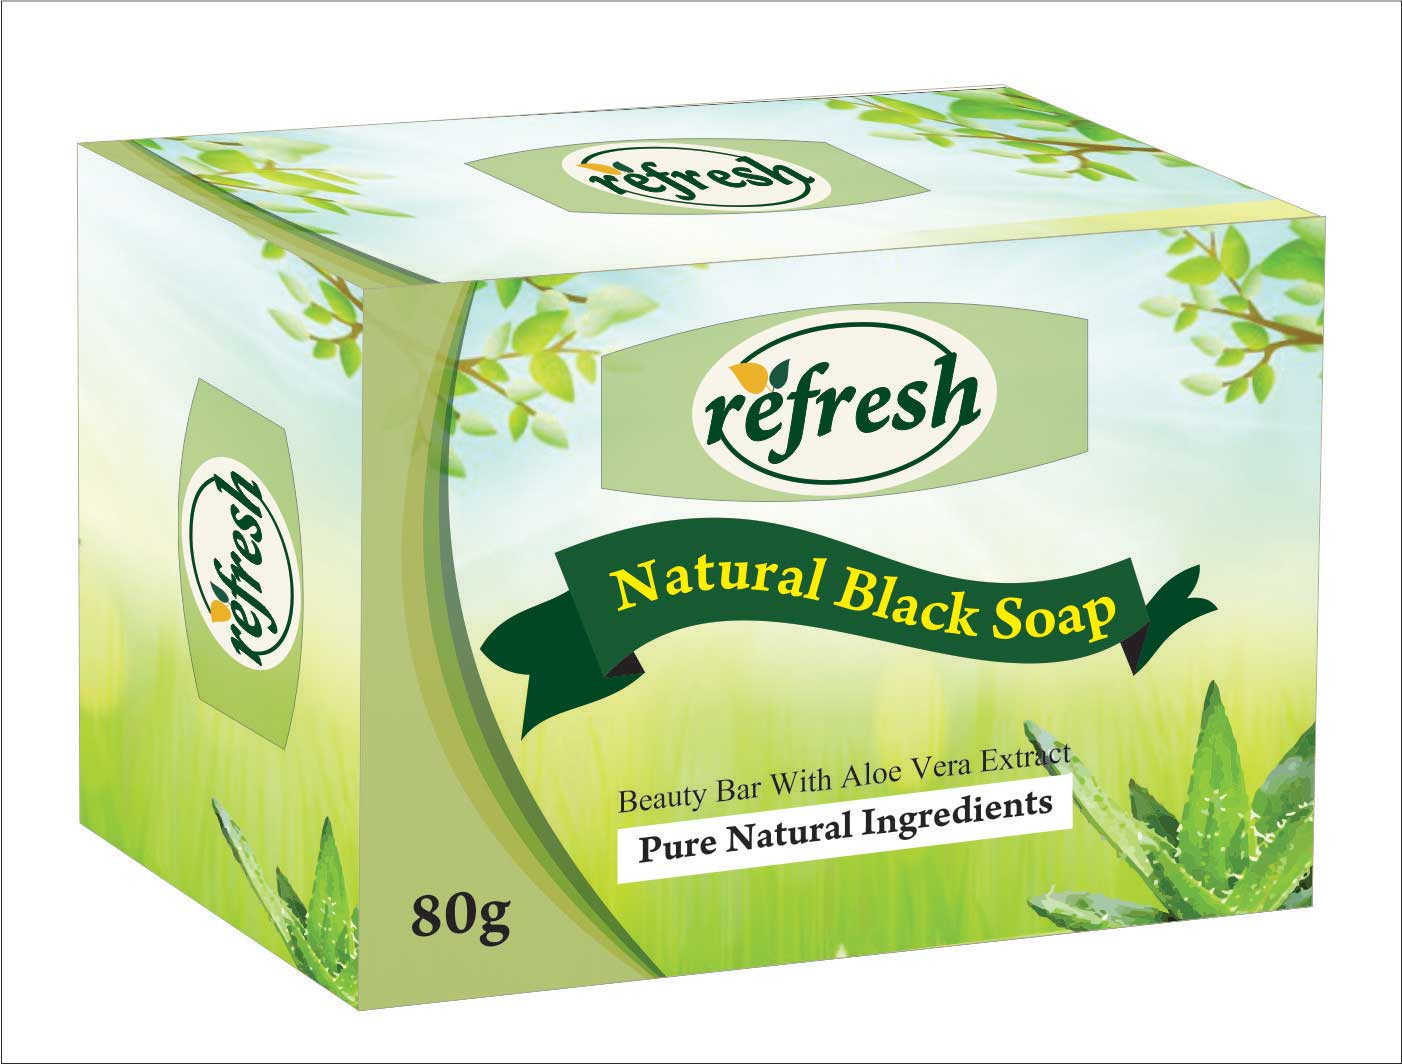 Soap Label Branding